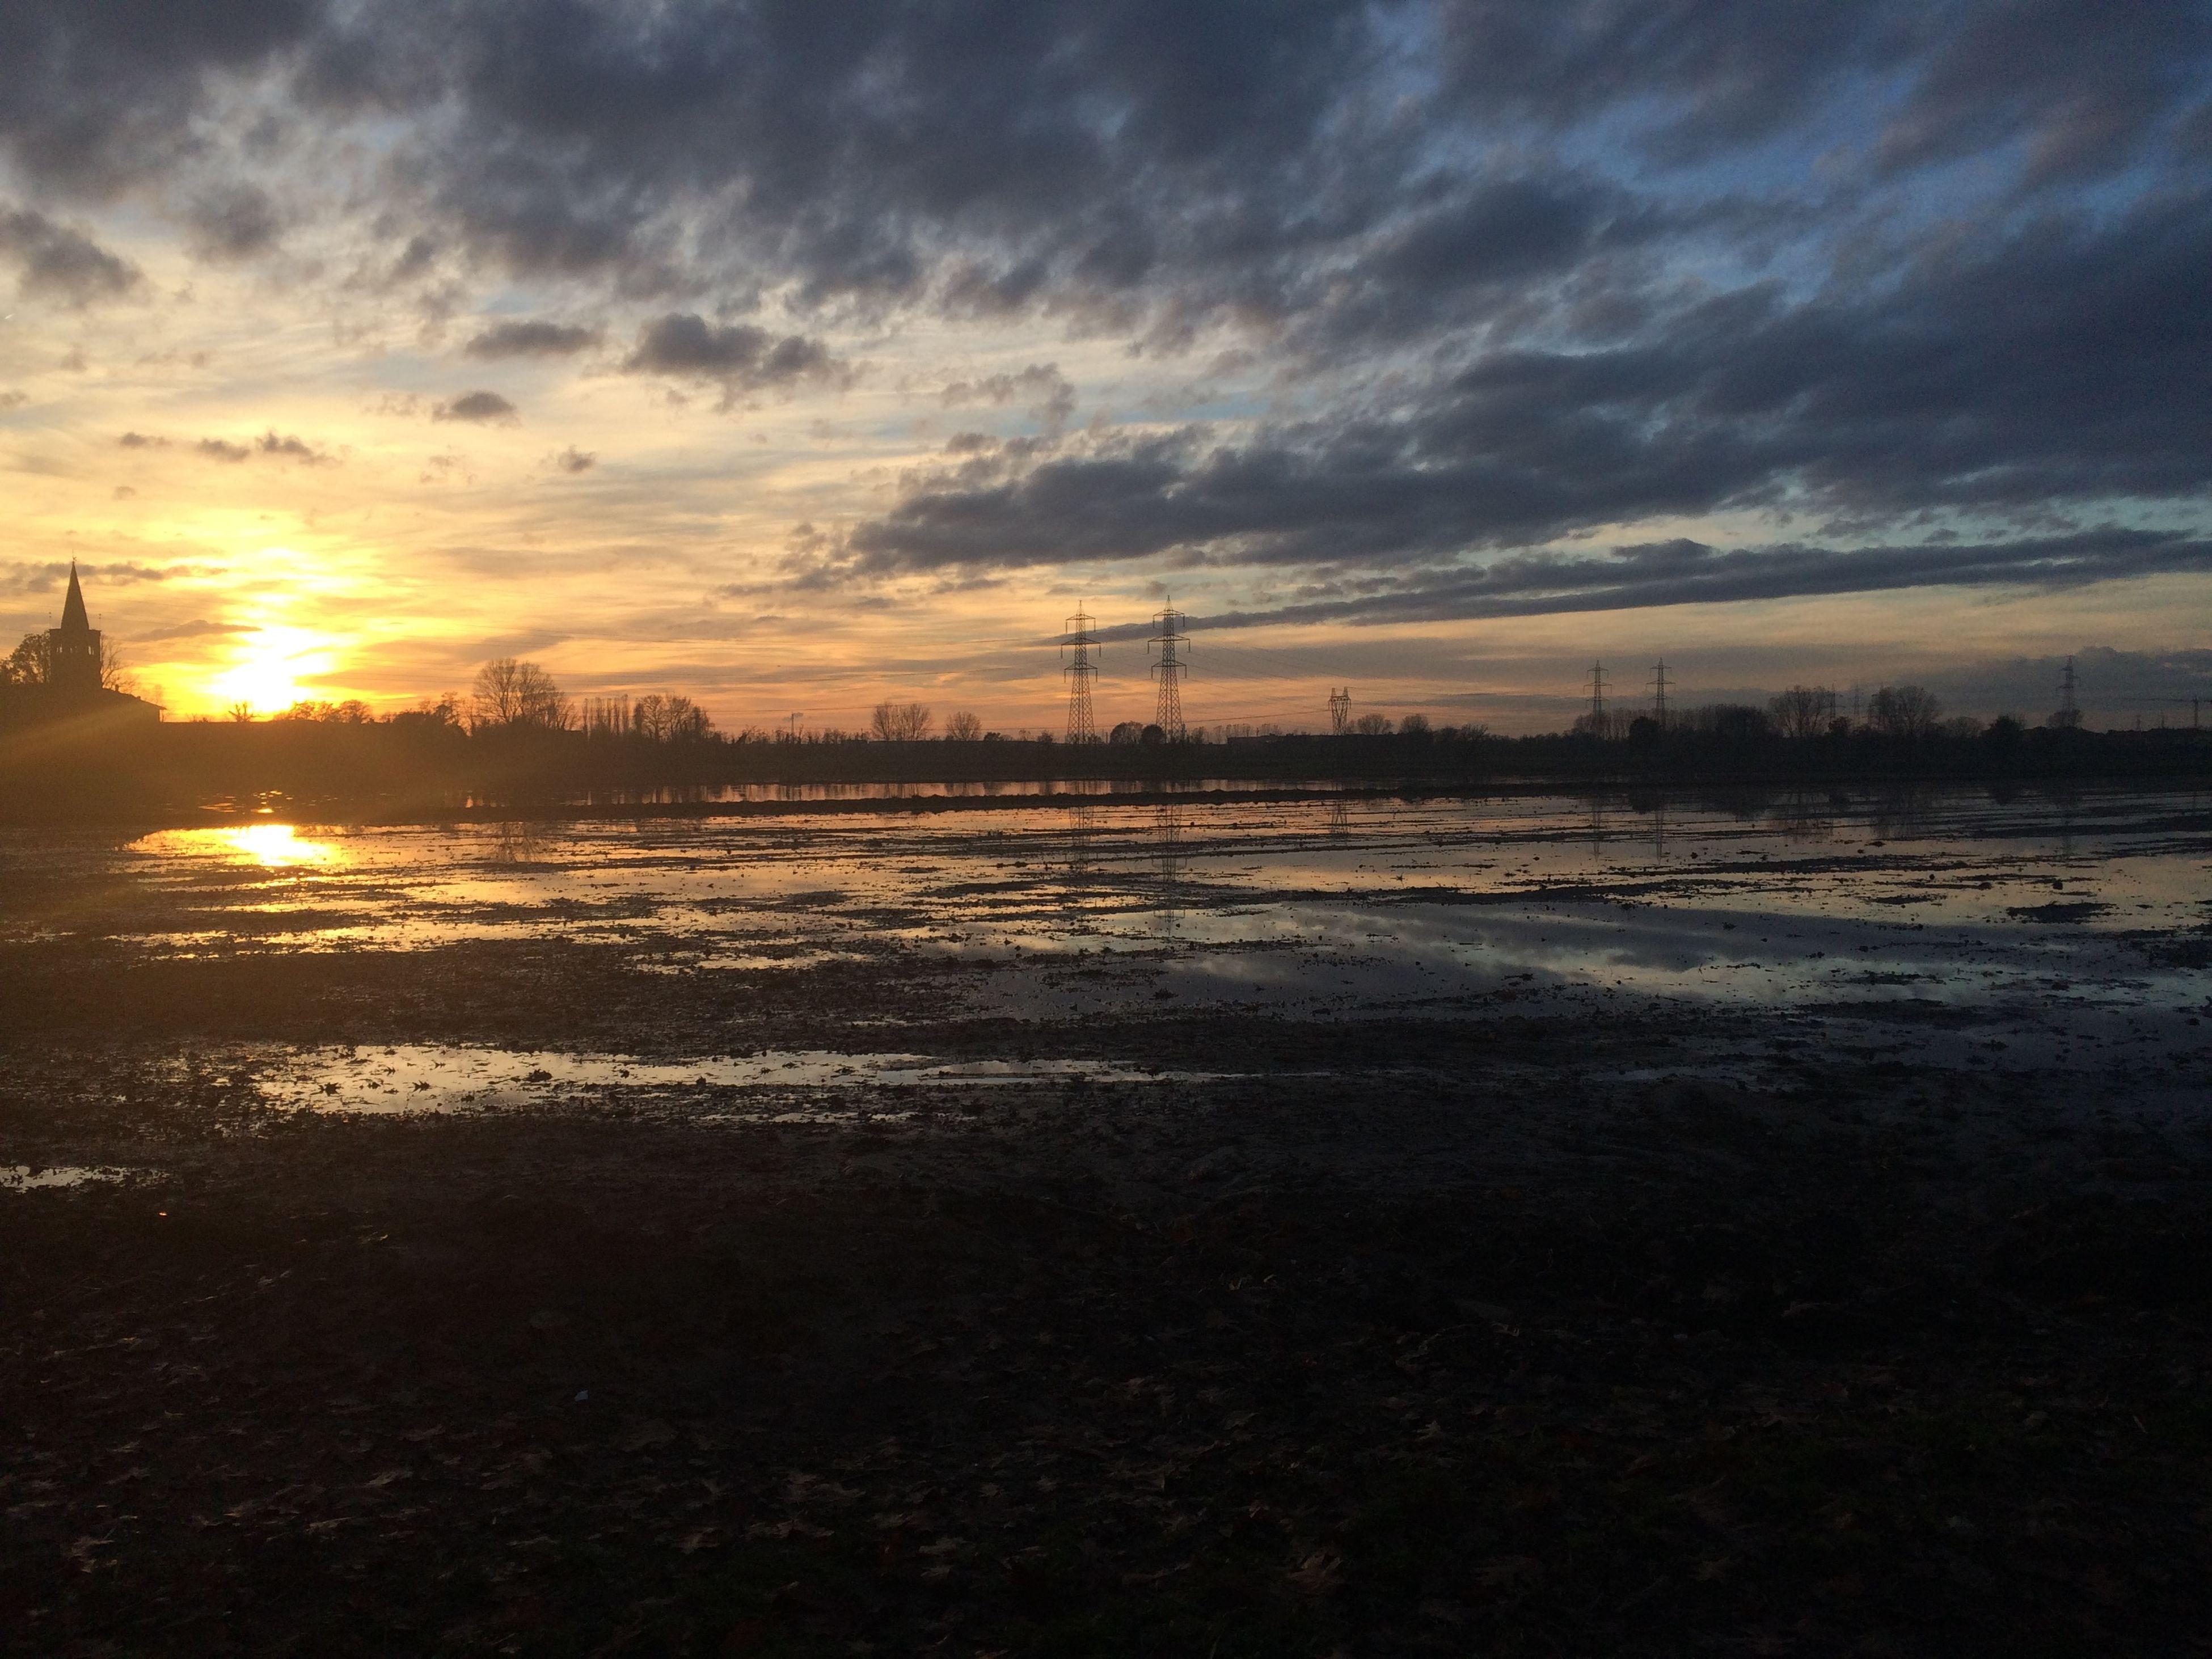 sunset, sky, cloud - sky, water, tranquil scene, scenics, tranquility, beauty in nature, sun, weather, nature, cold temperature, cloudy, silhouette, snow, orange color, sea, winter, idyllic, cloud